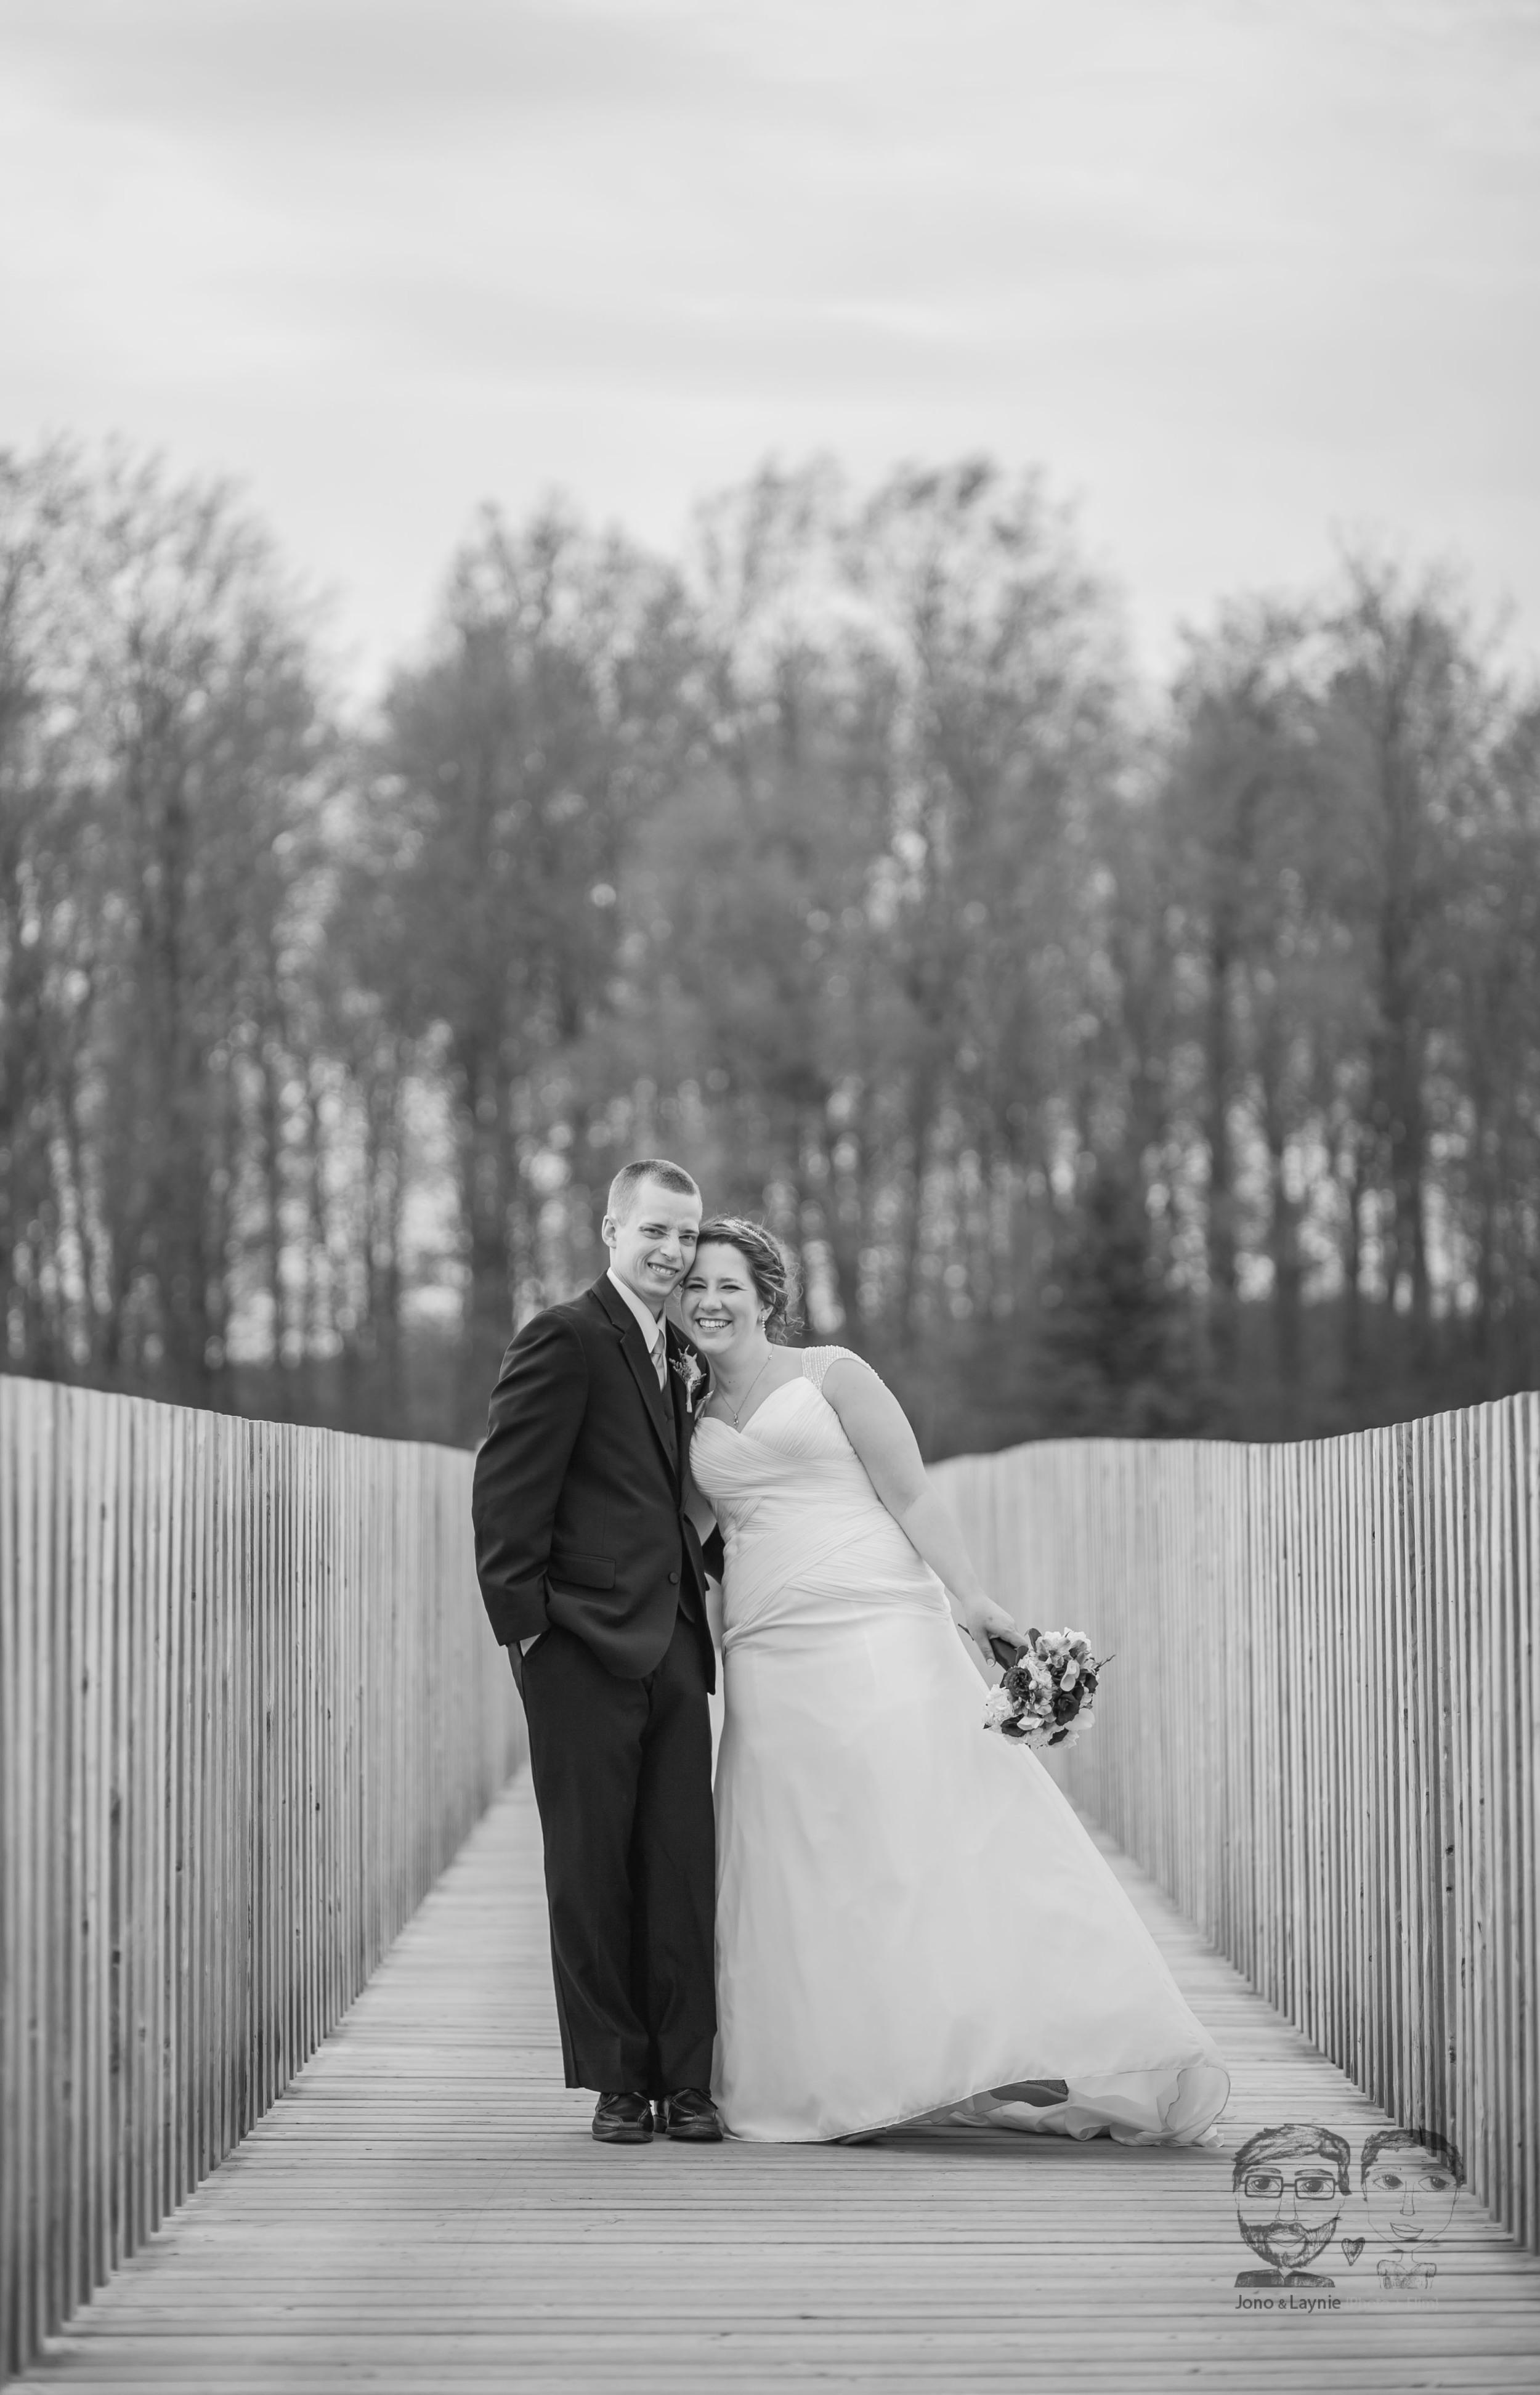 35Toronto Wedding Photographers and Videographers-Jono & Laynie Co.-Orangeville Wedding.jpg